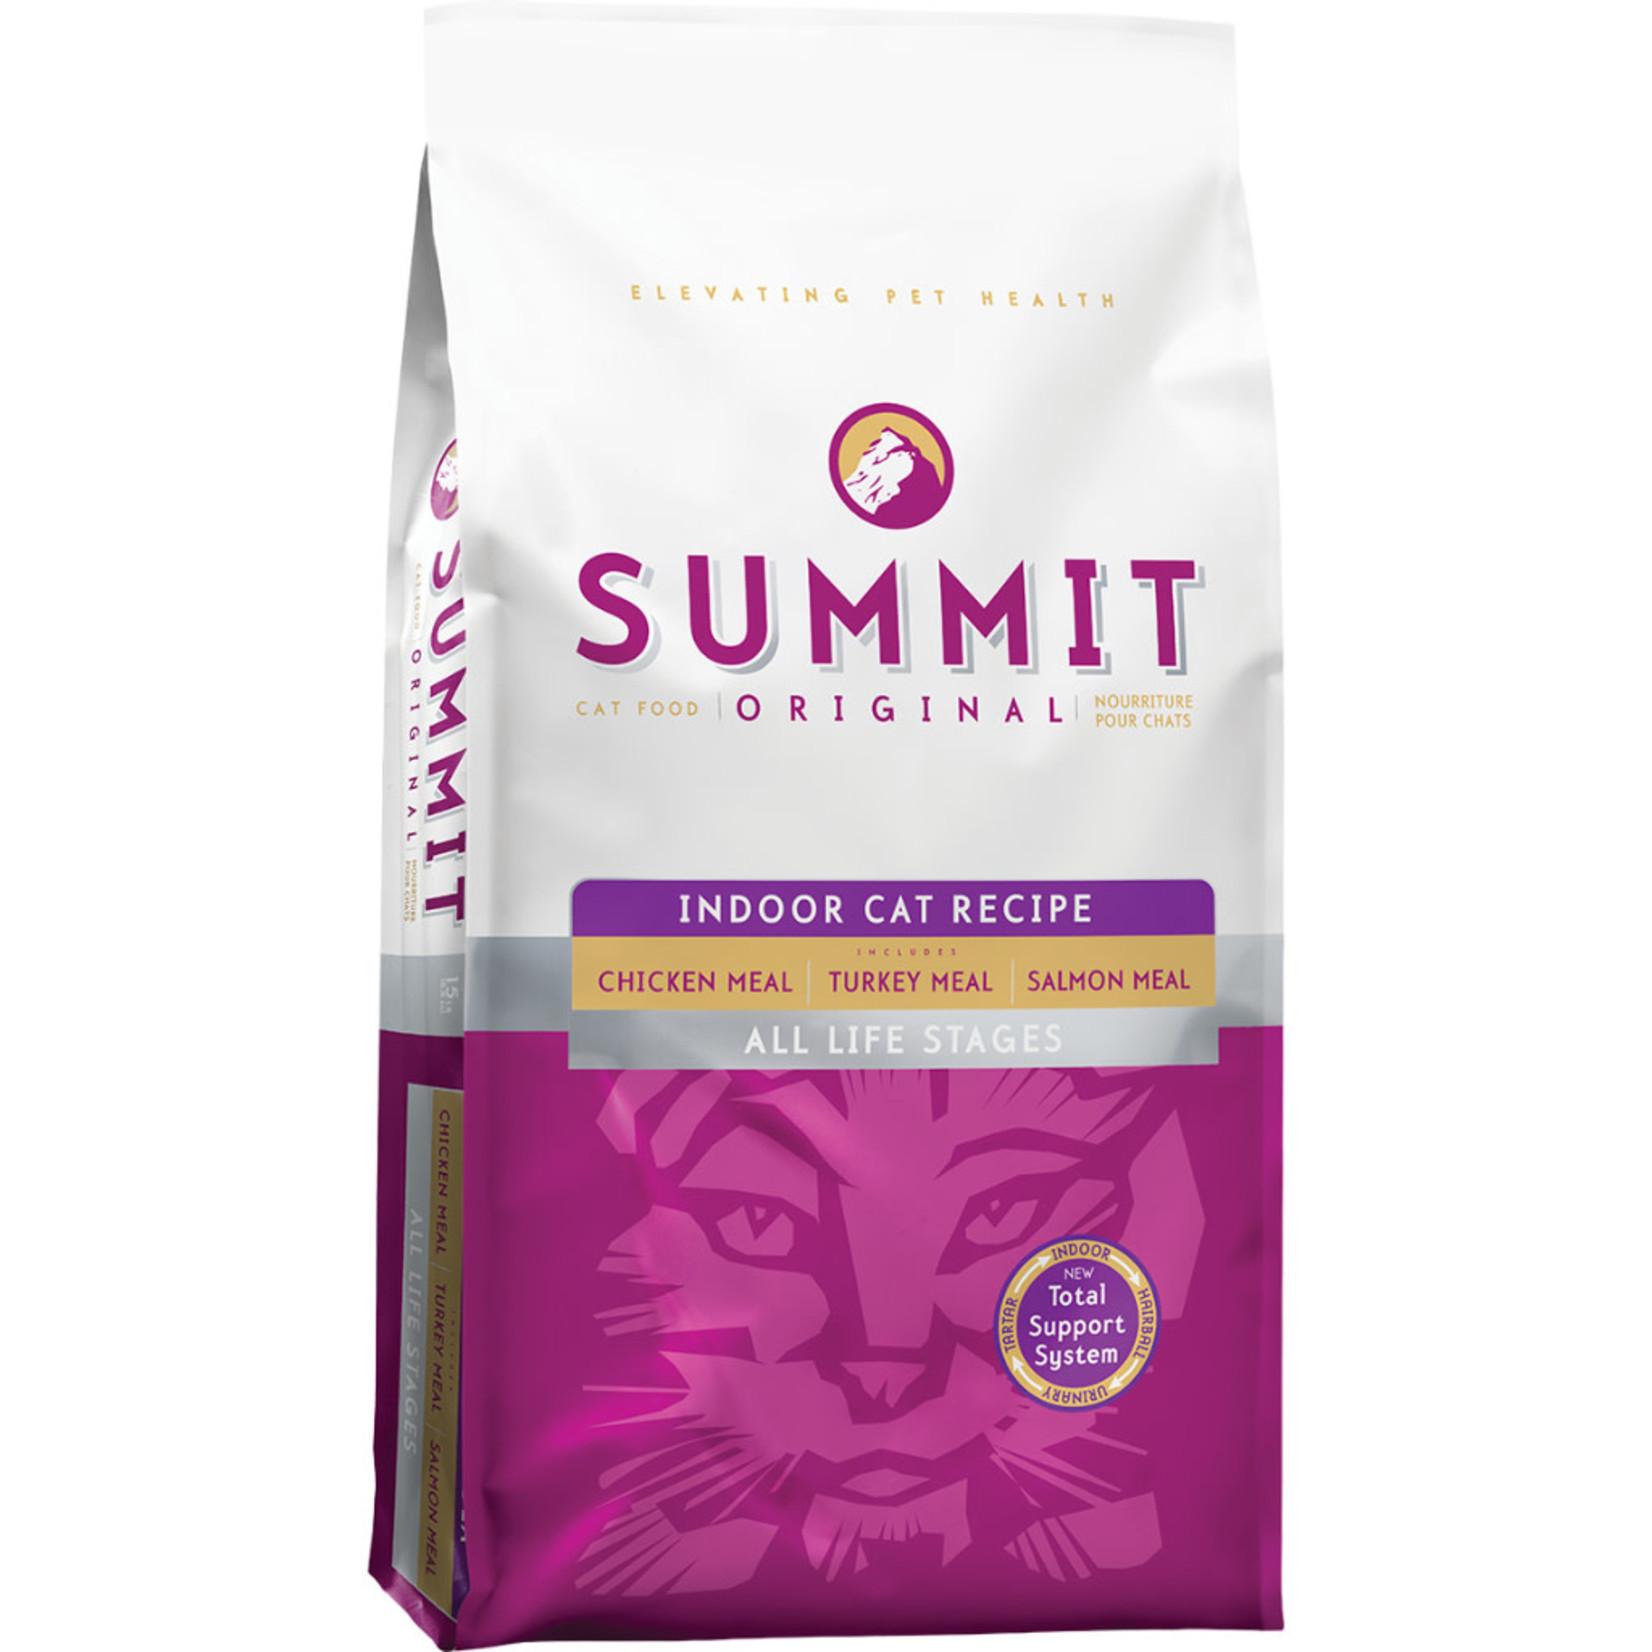 Summitt Original 3 Meat Indoor 15LB / Cat *Special Order